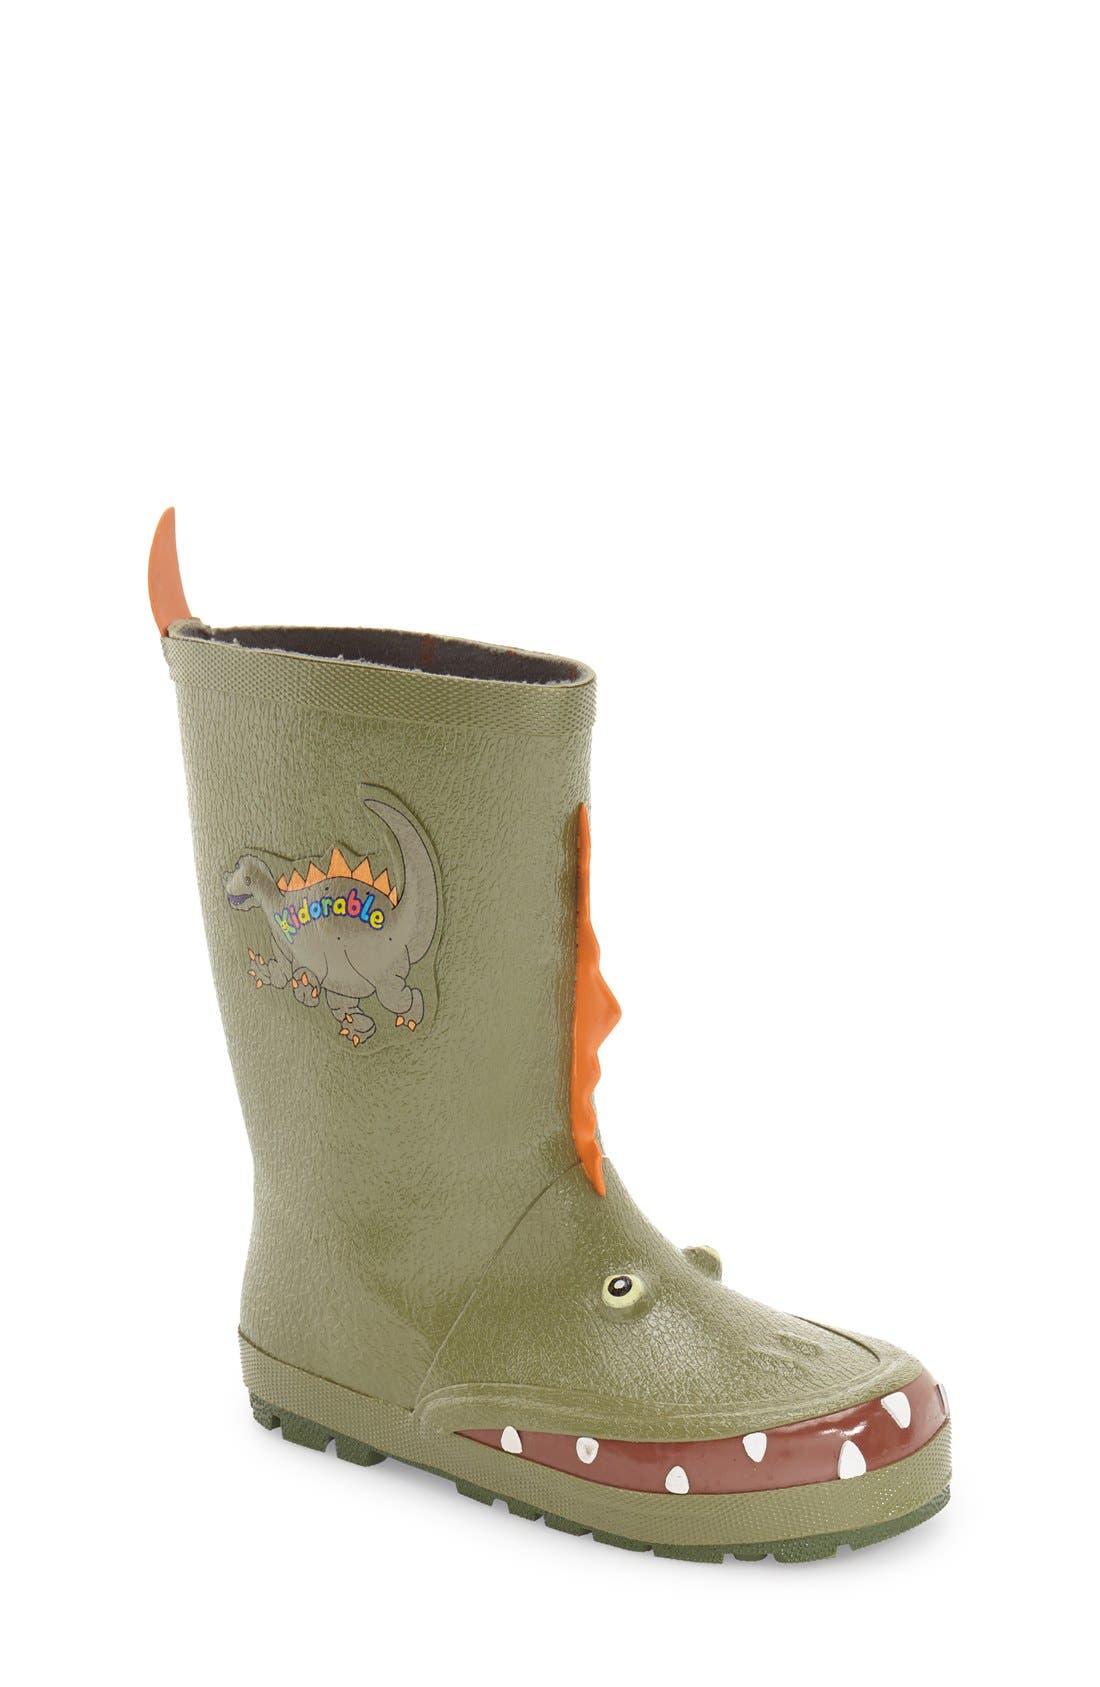 KIDORABLE 'Dinosaur' Waterproof Rain Boot